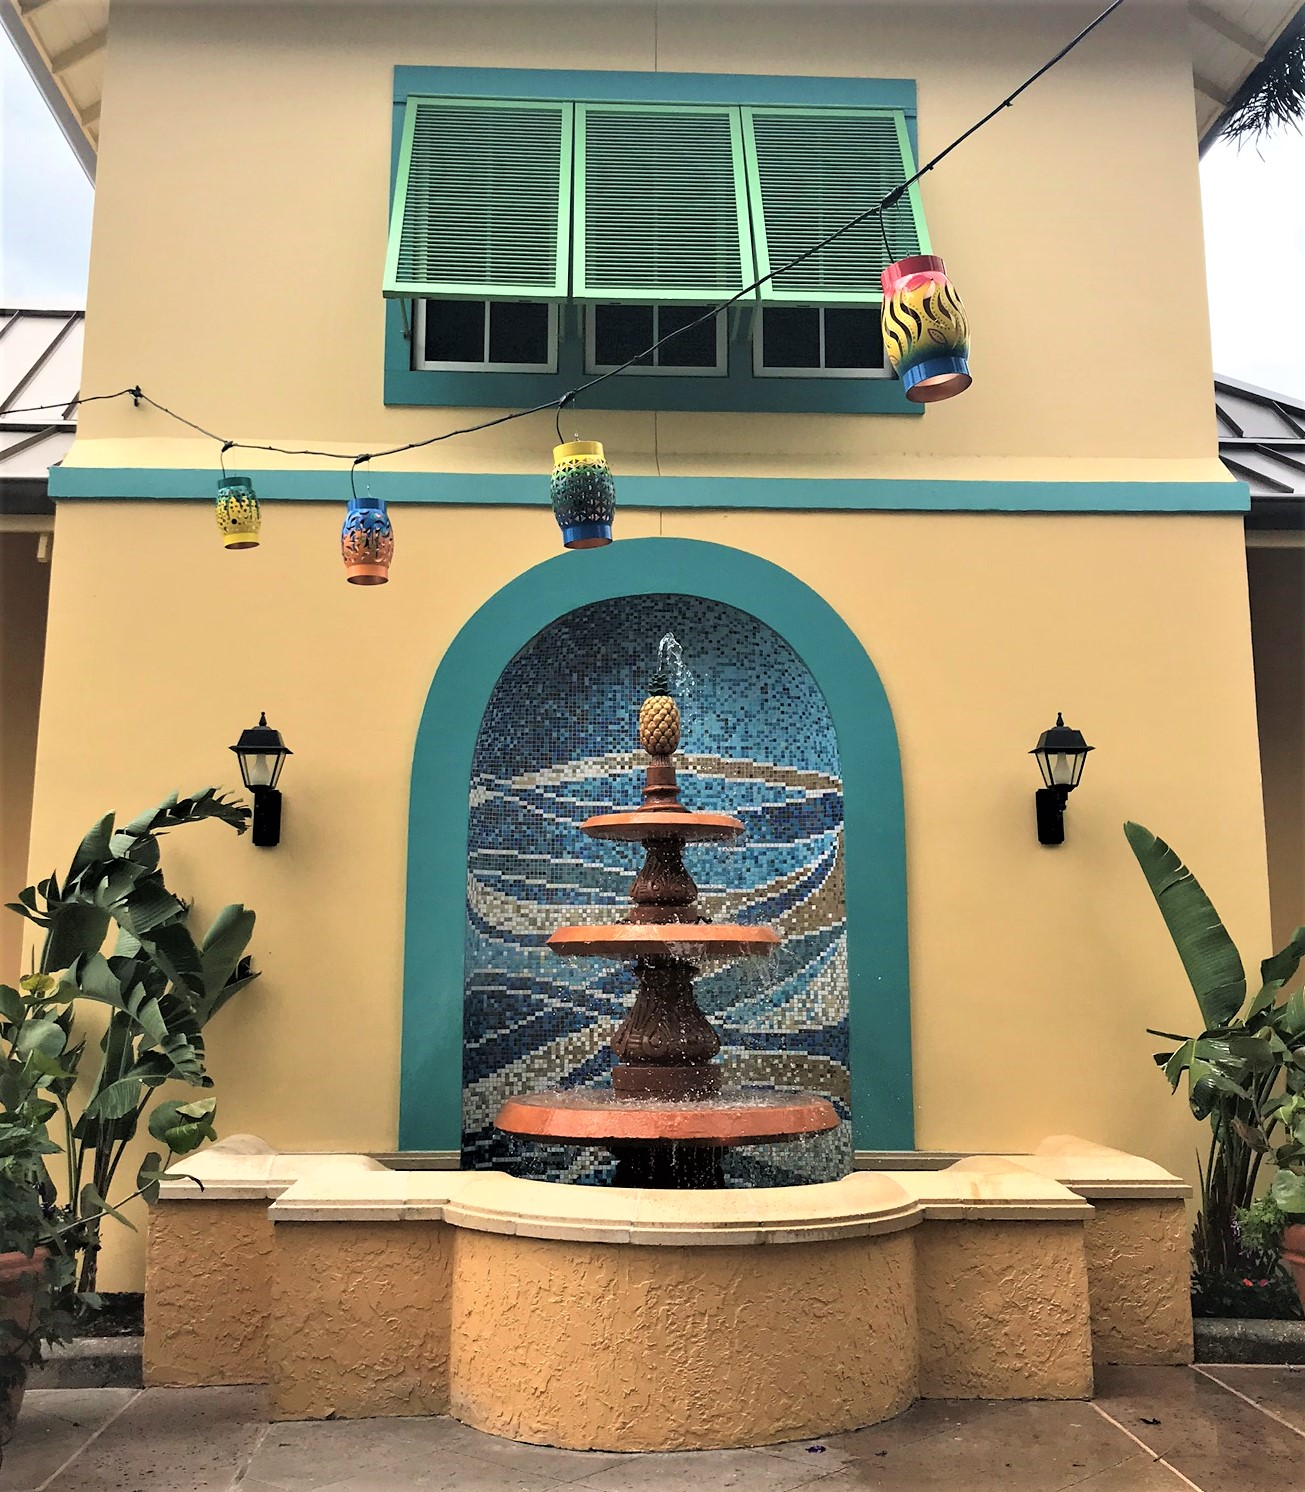 exterior fountain at caribbean beach resort